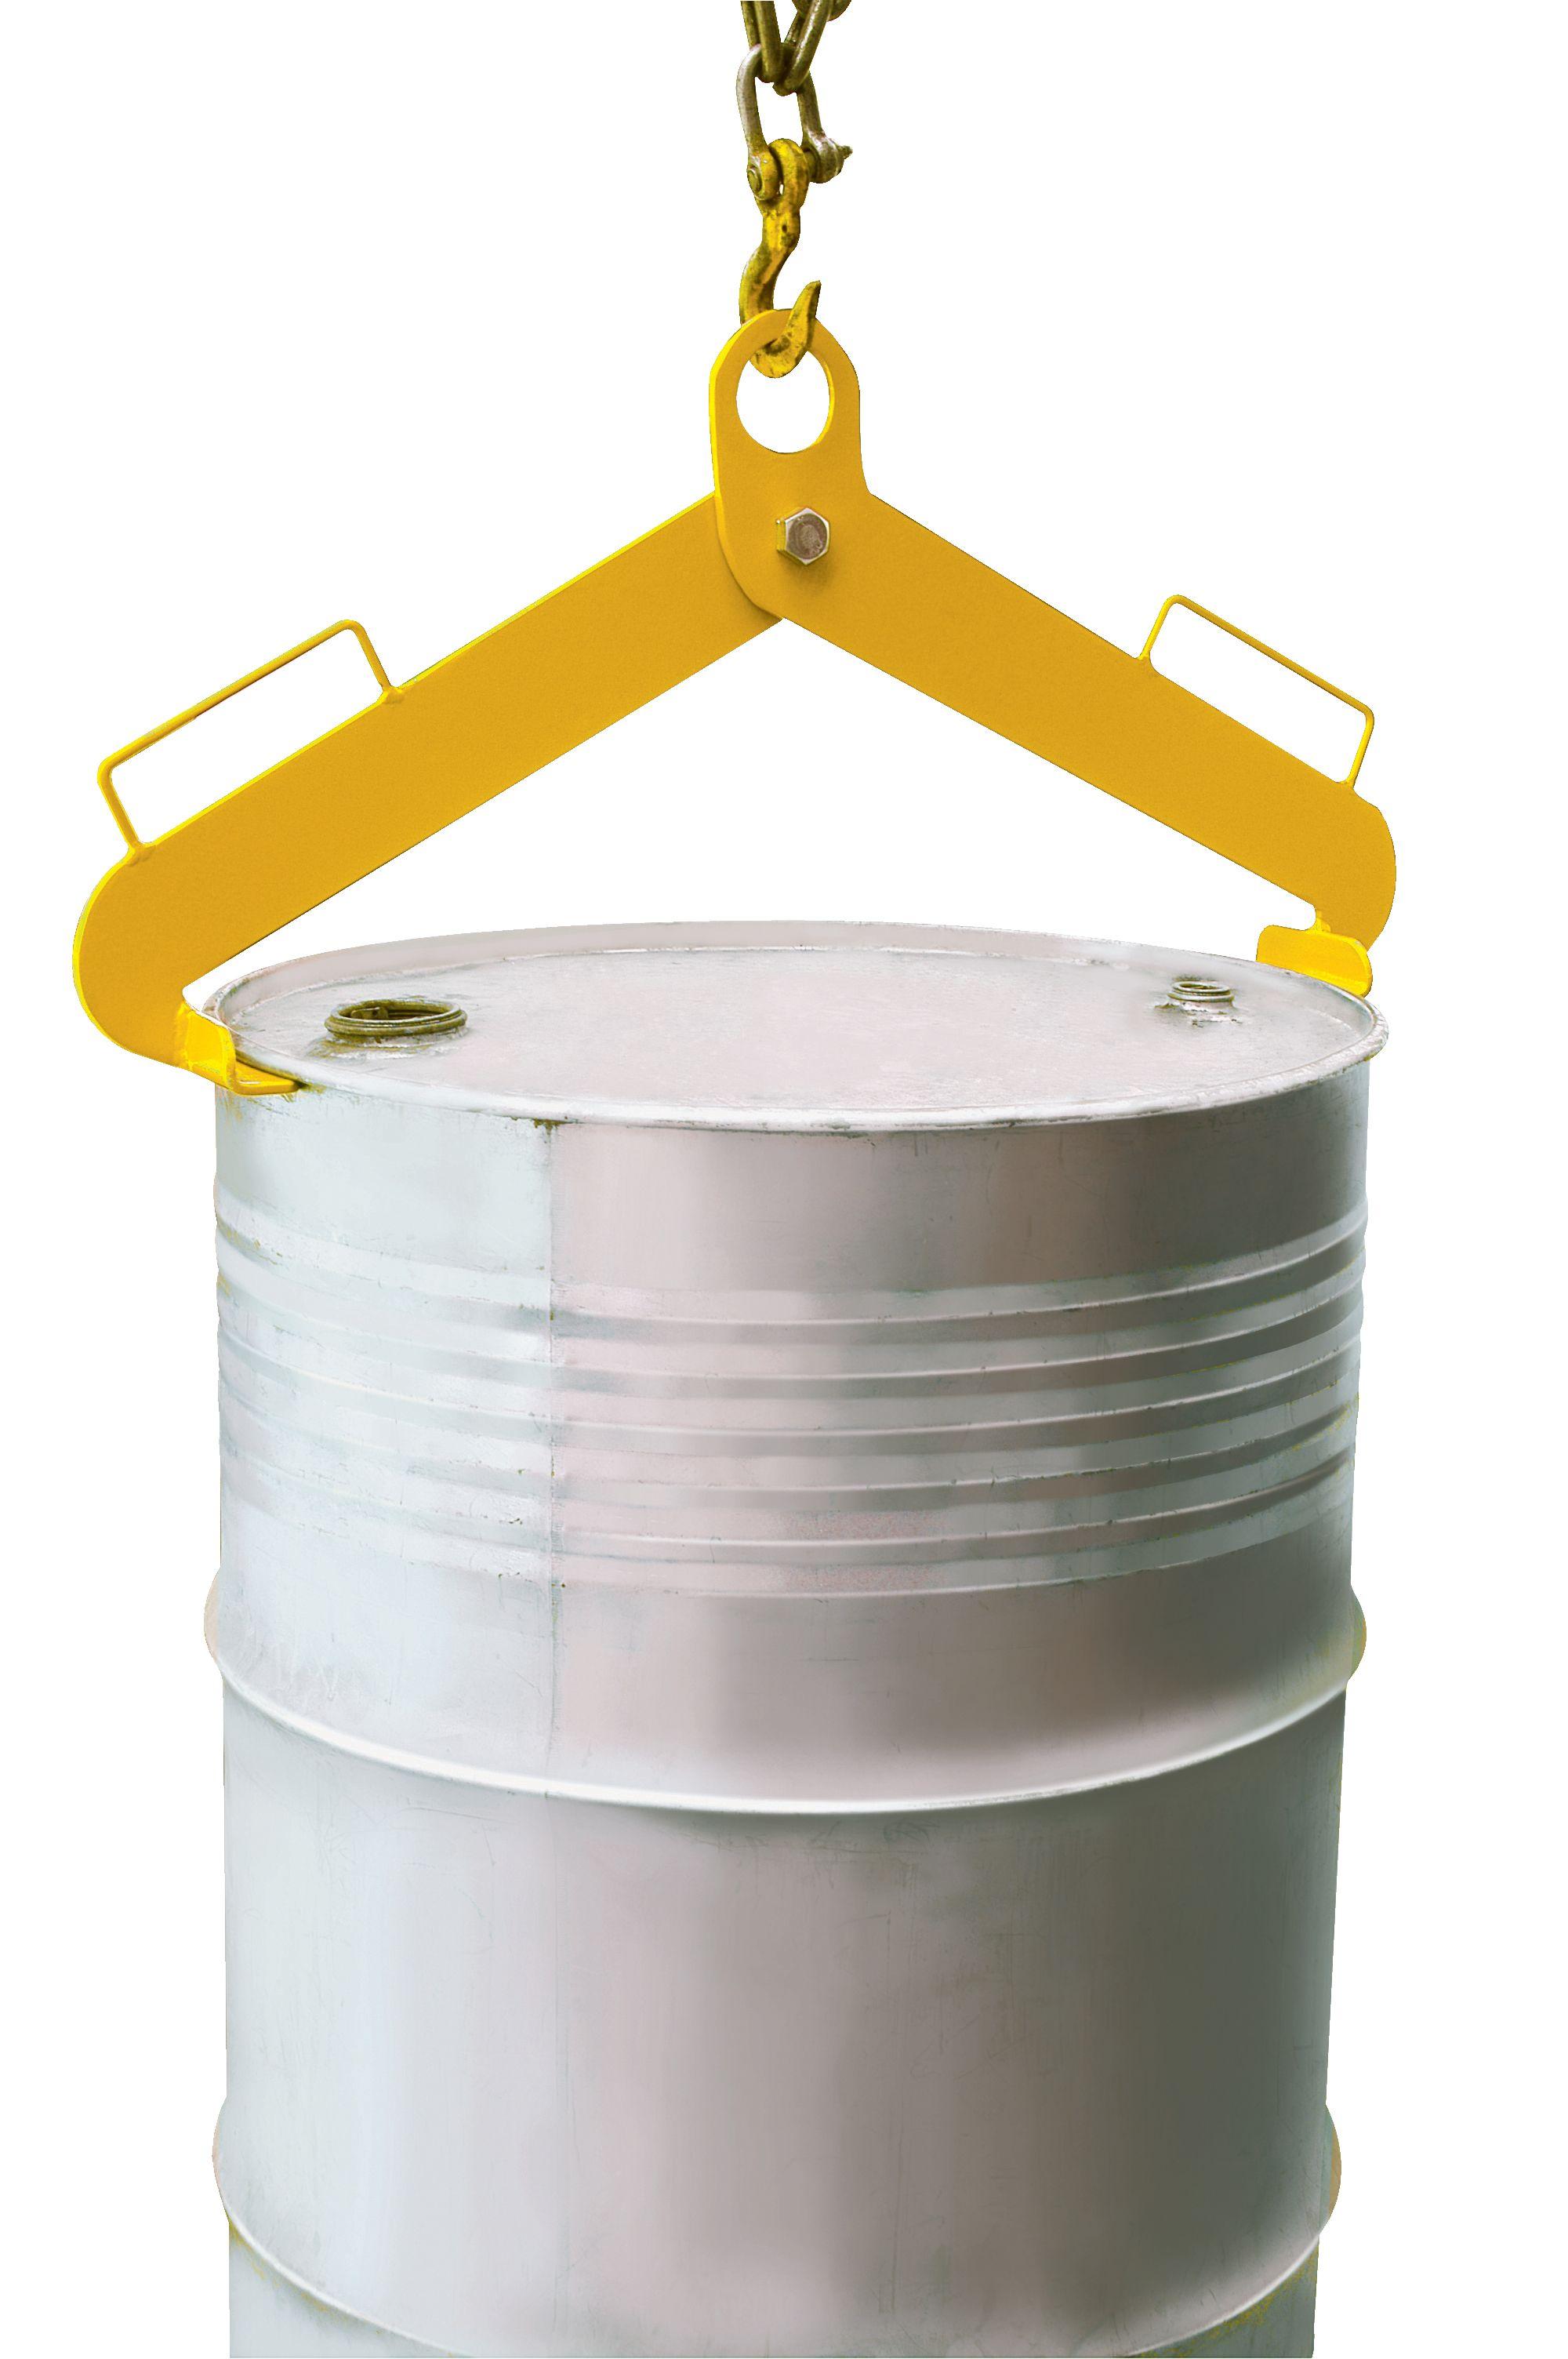 Pin On Drum Lifting Equipment